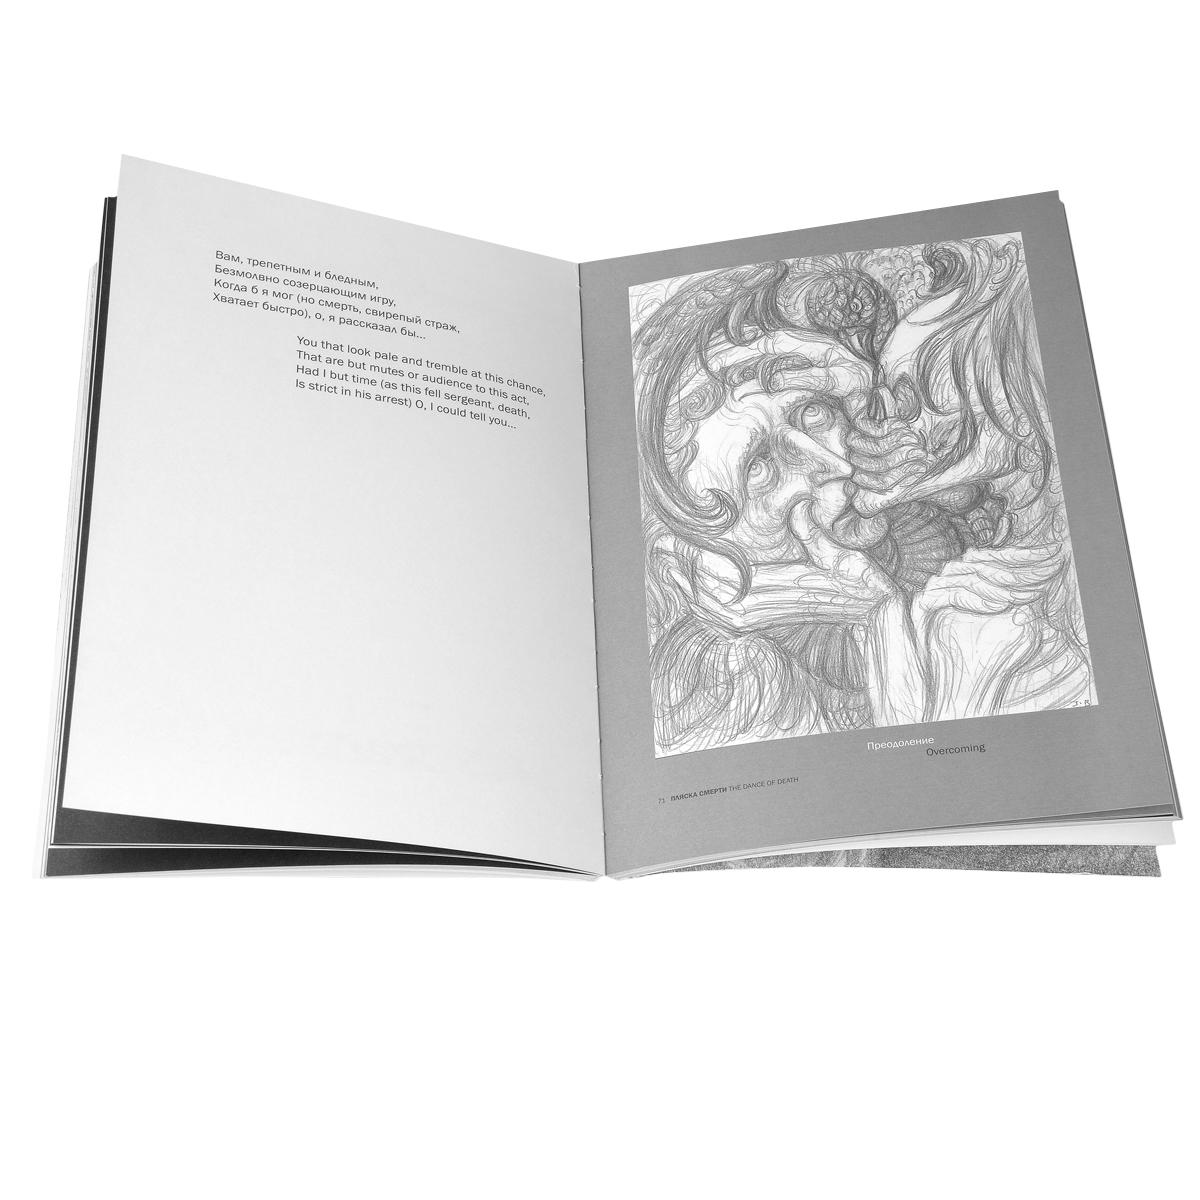 Hamletyorick. 37 карандашных рисунков Юлии Бугуевой / 37 pencil drawings by Julia Bugueva